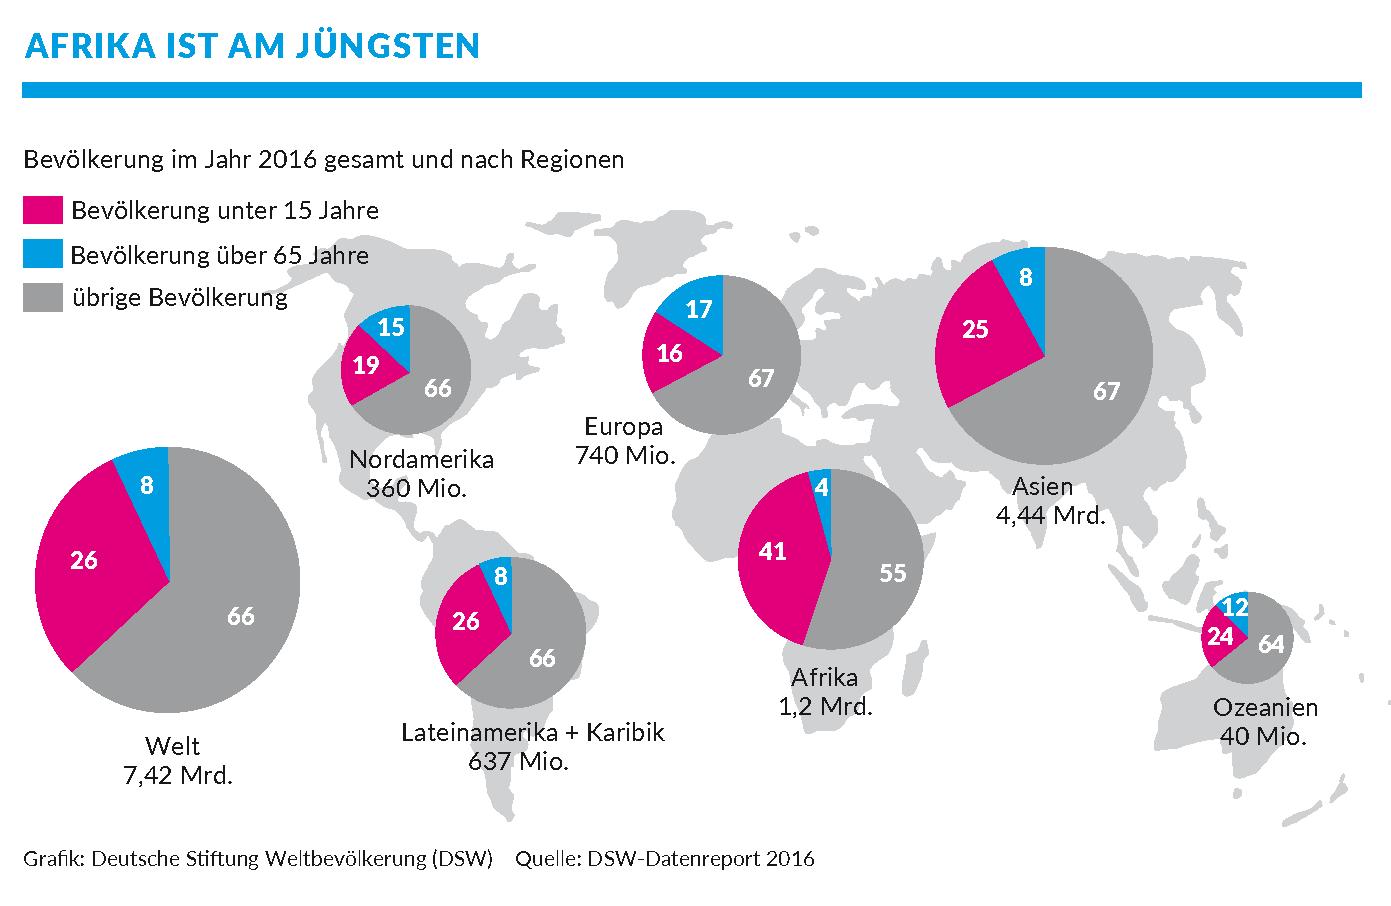 Grafik: Altersstruktur der Weltbevölkerung, DSW-Datenreport 2016